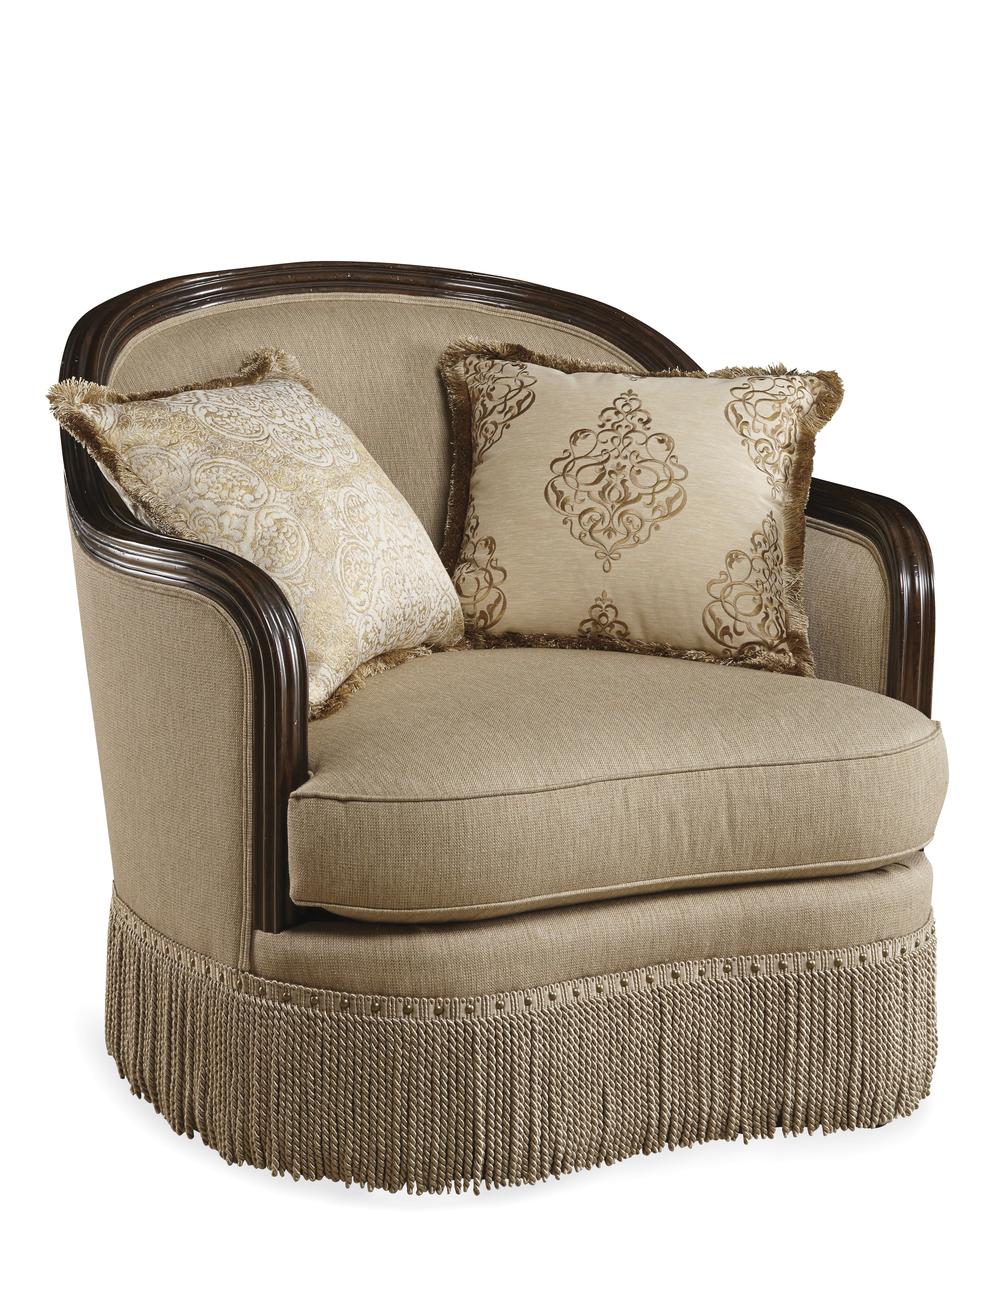 A.R.T. Furniture - Matching Chair